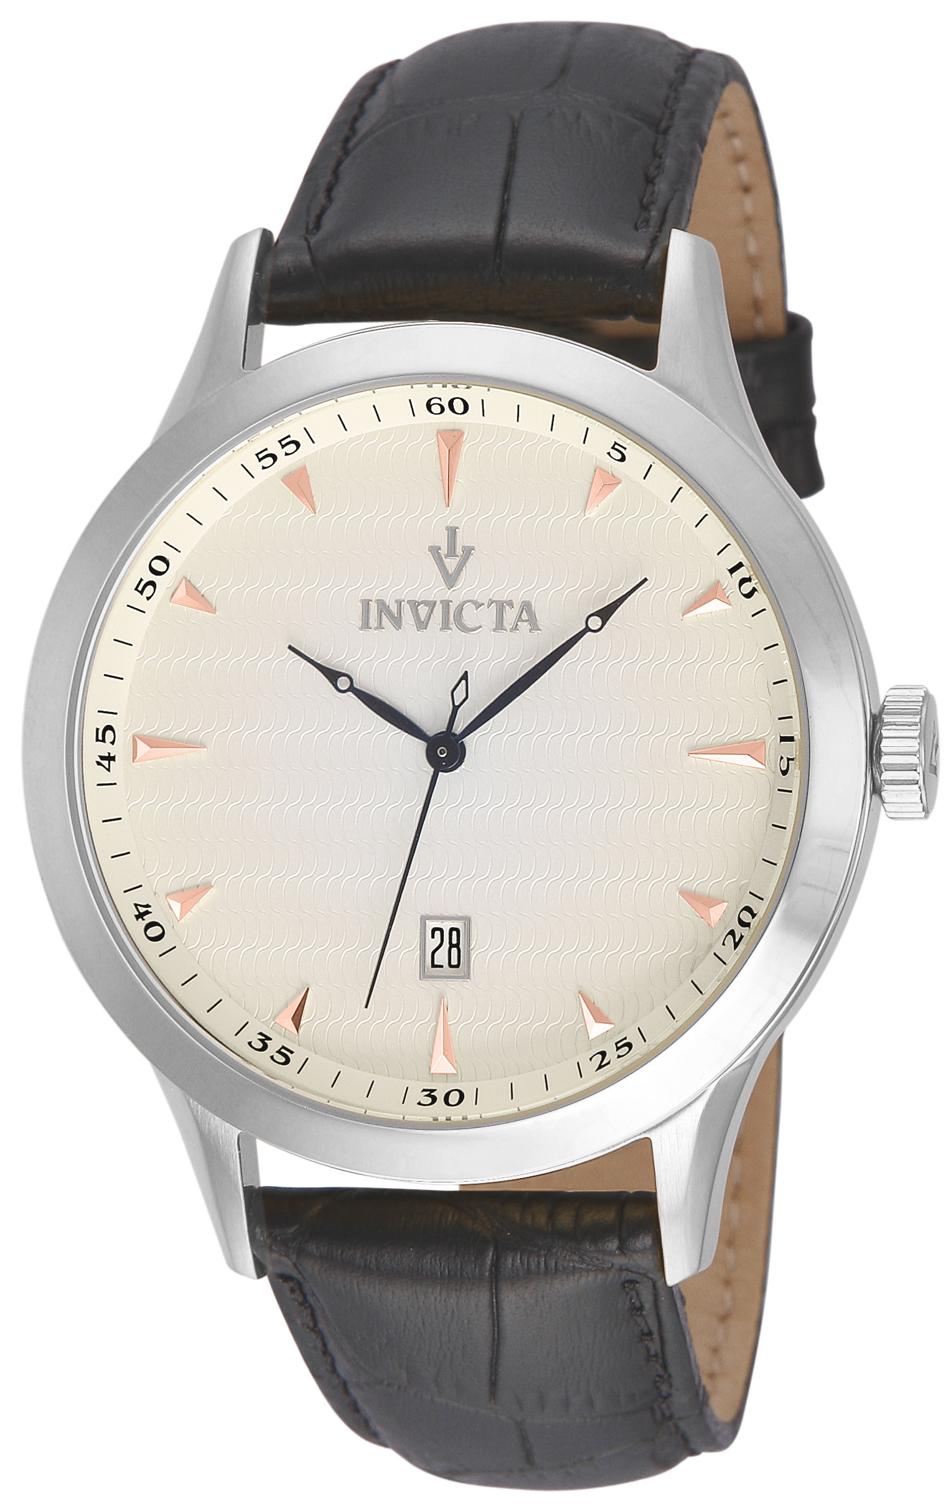 Invicta Men's 12222 Vintage Quartz 3 Hand Metallic White Dial Watch